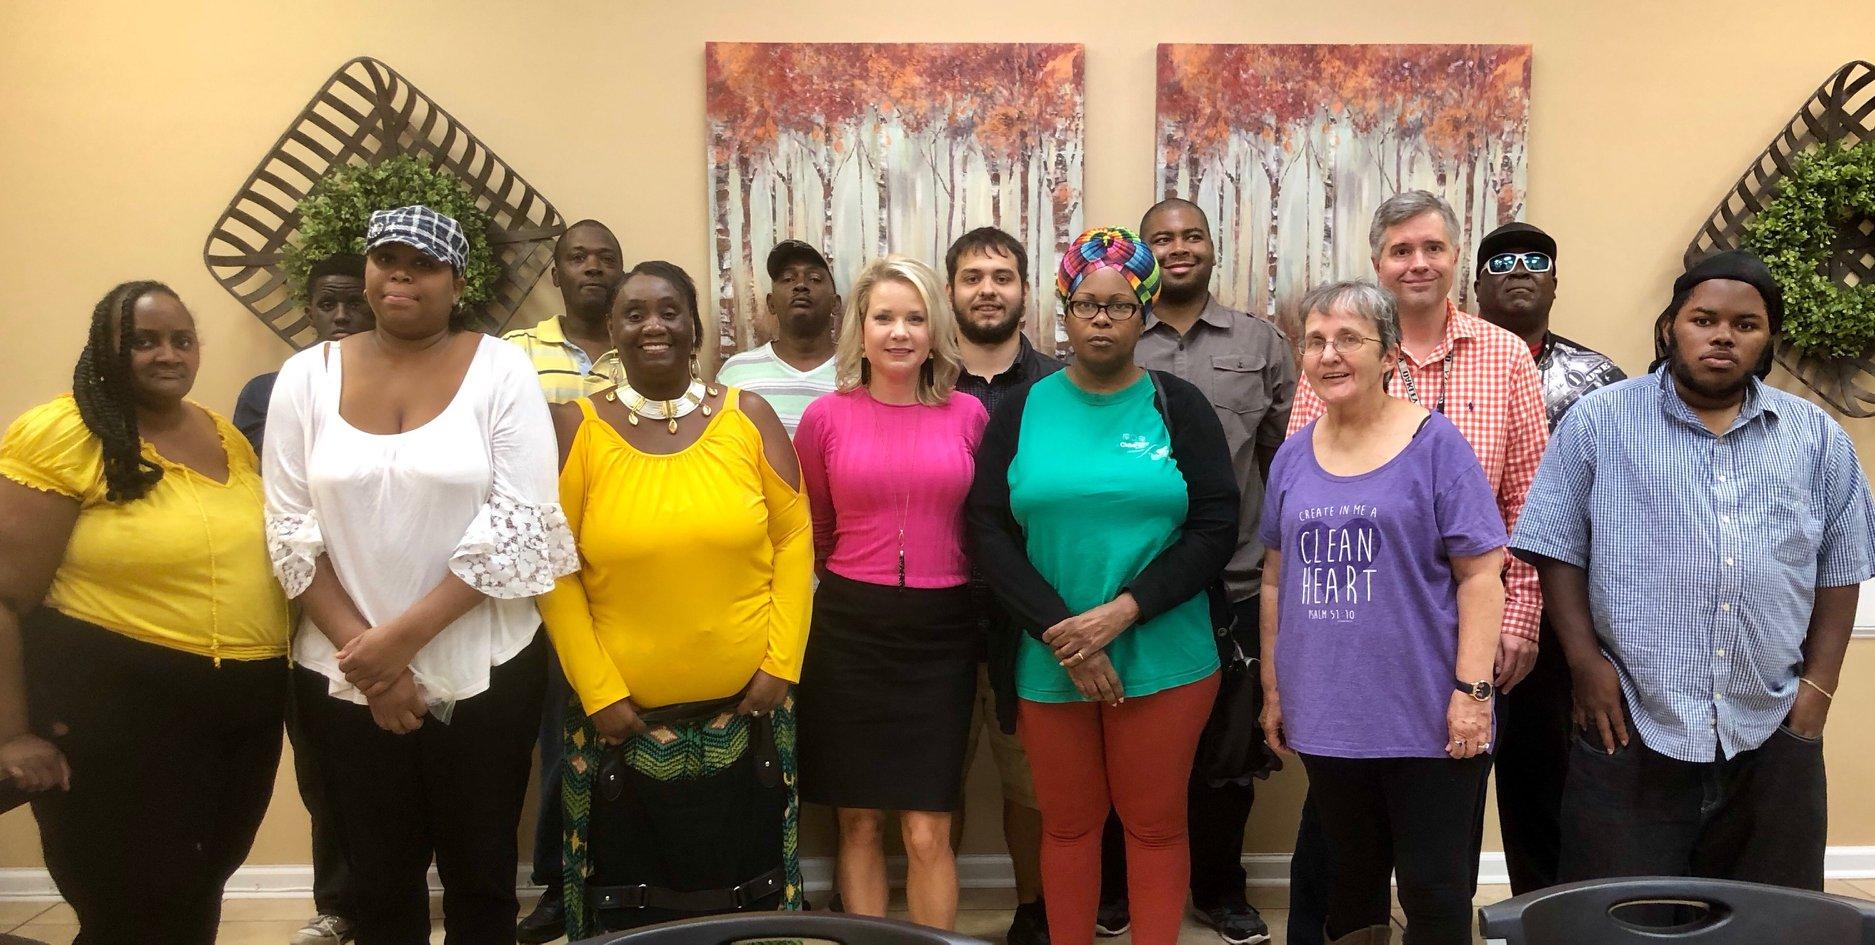 CCO Roz Johnson Delivers 4th Annual Mindfulness Presentation